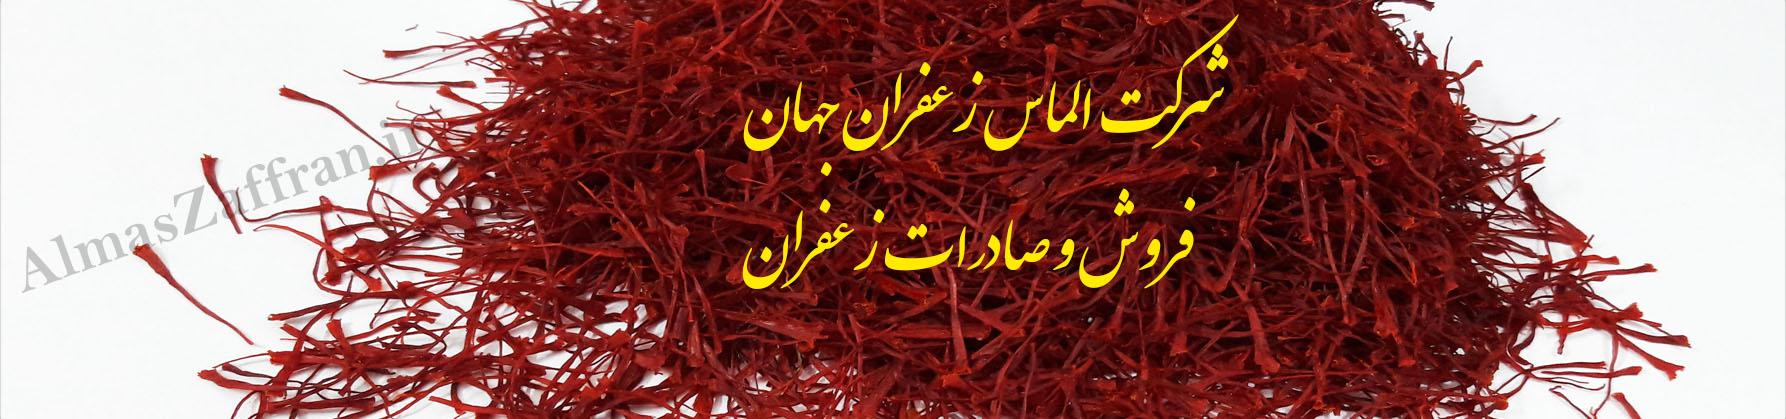 قیمت هر کیلو زعفران اصل